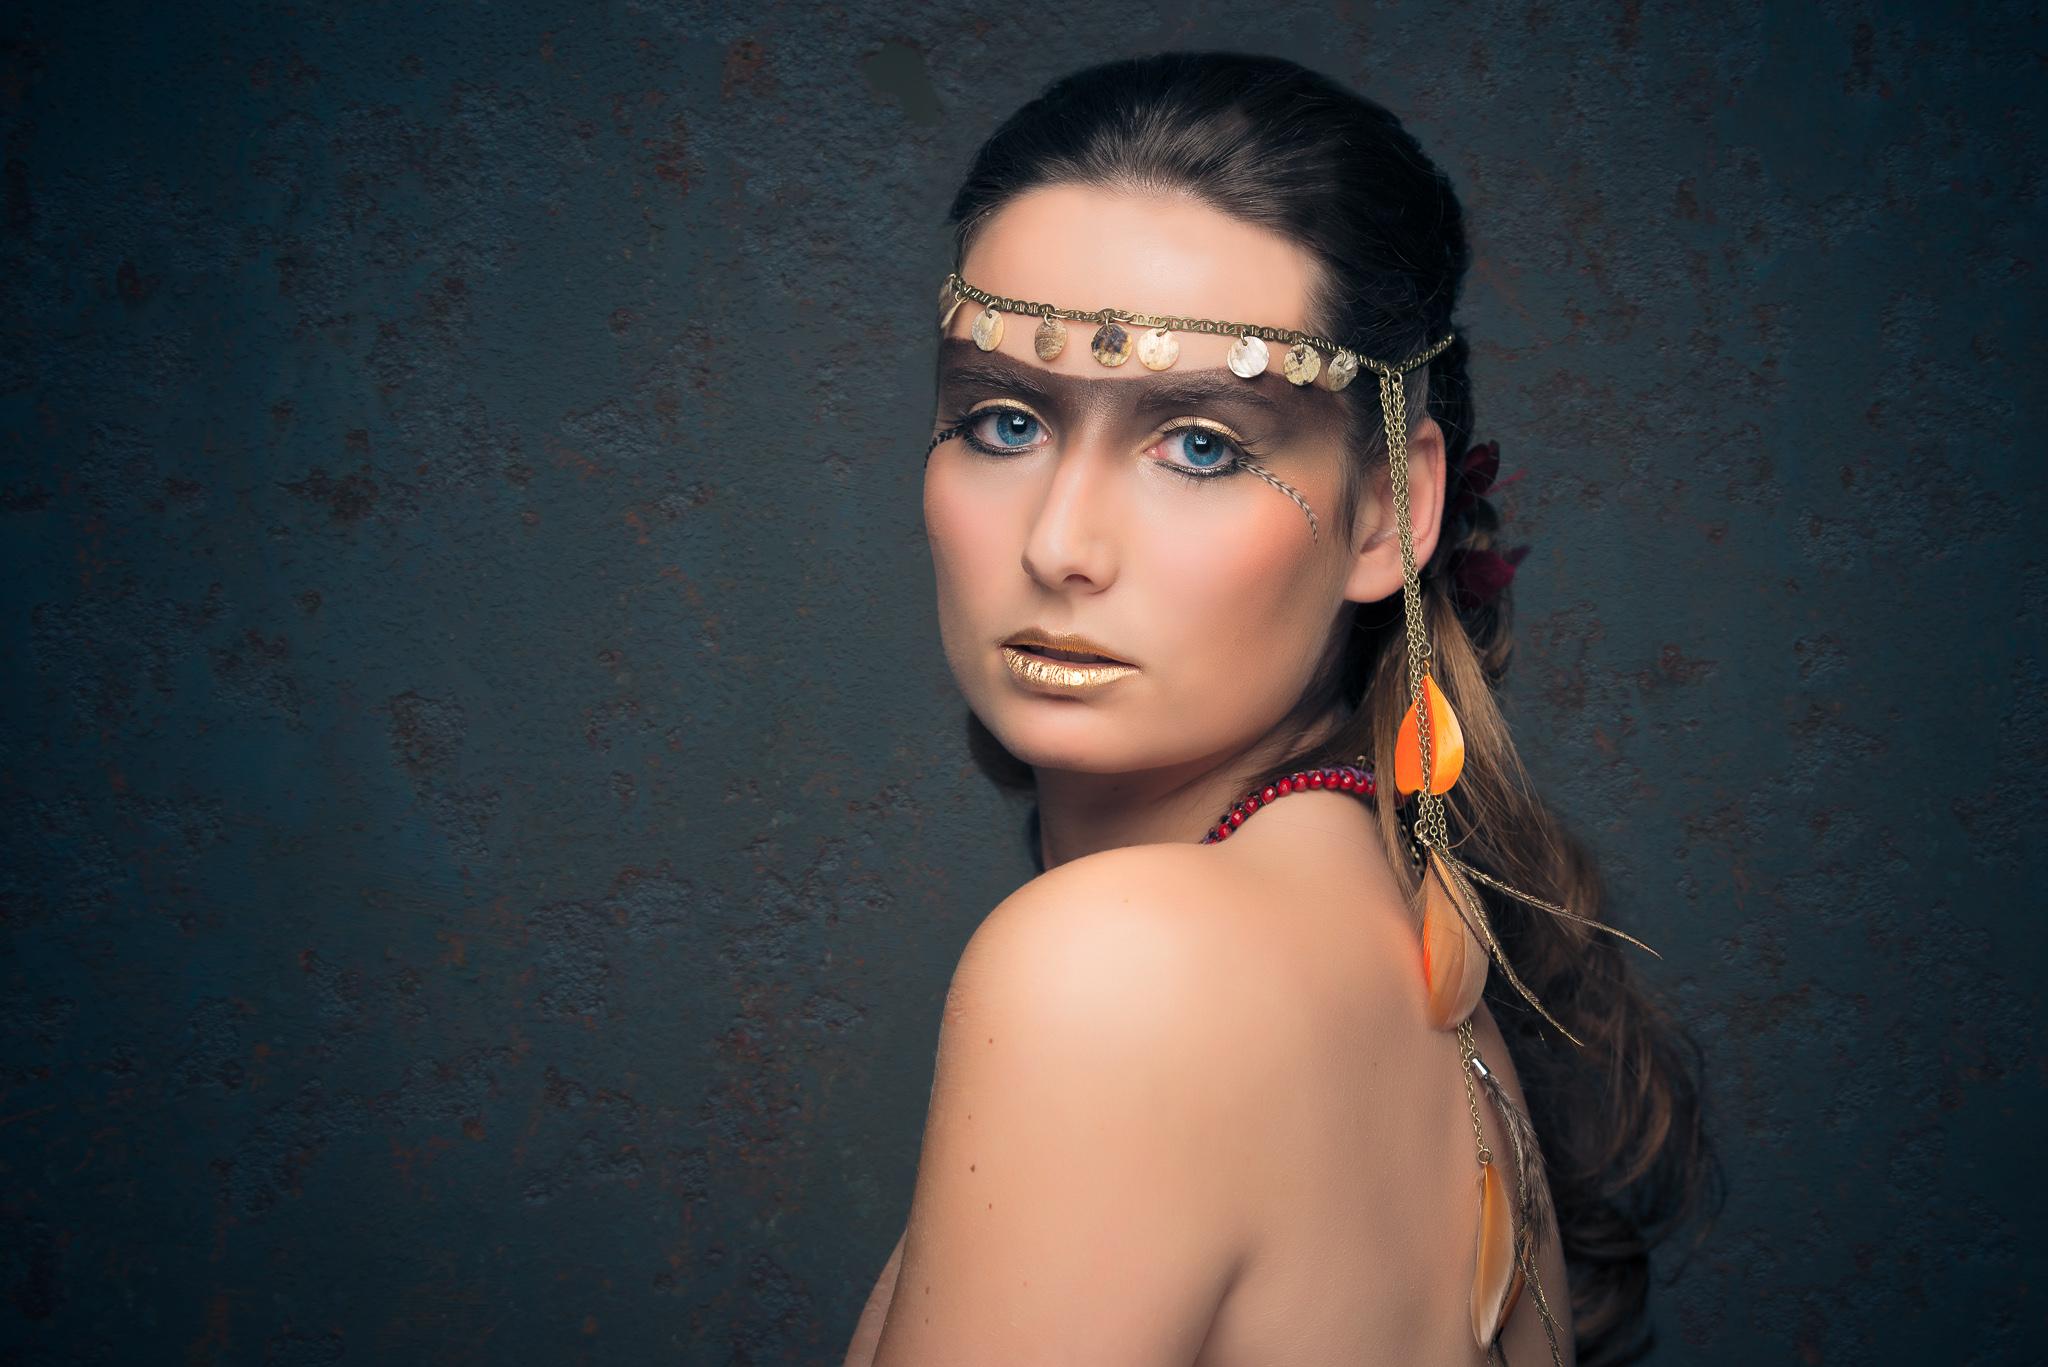 Axelle B. collection haute coiffure 2015 headband sequin esprit indien avec  plumes